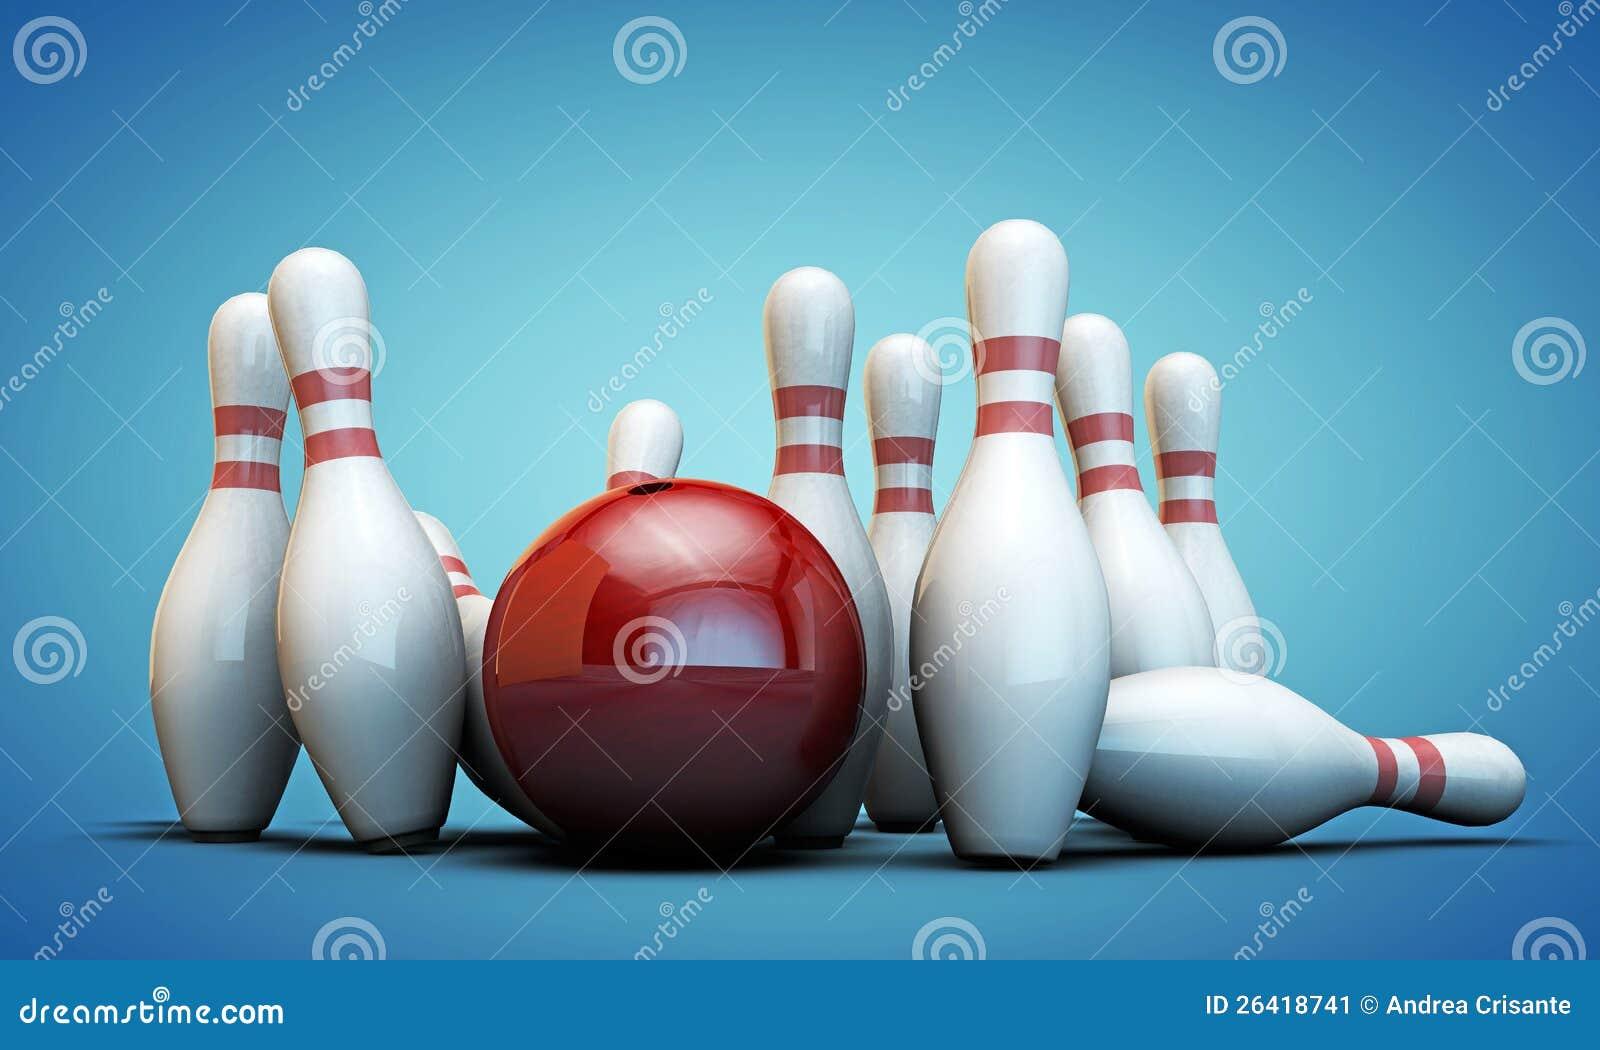 Contactos de bowling